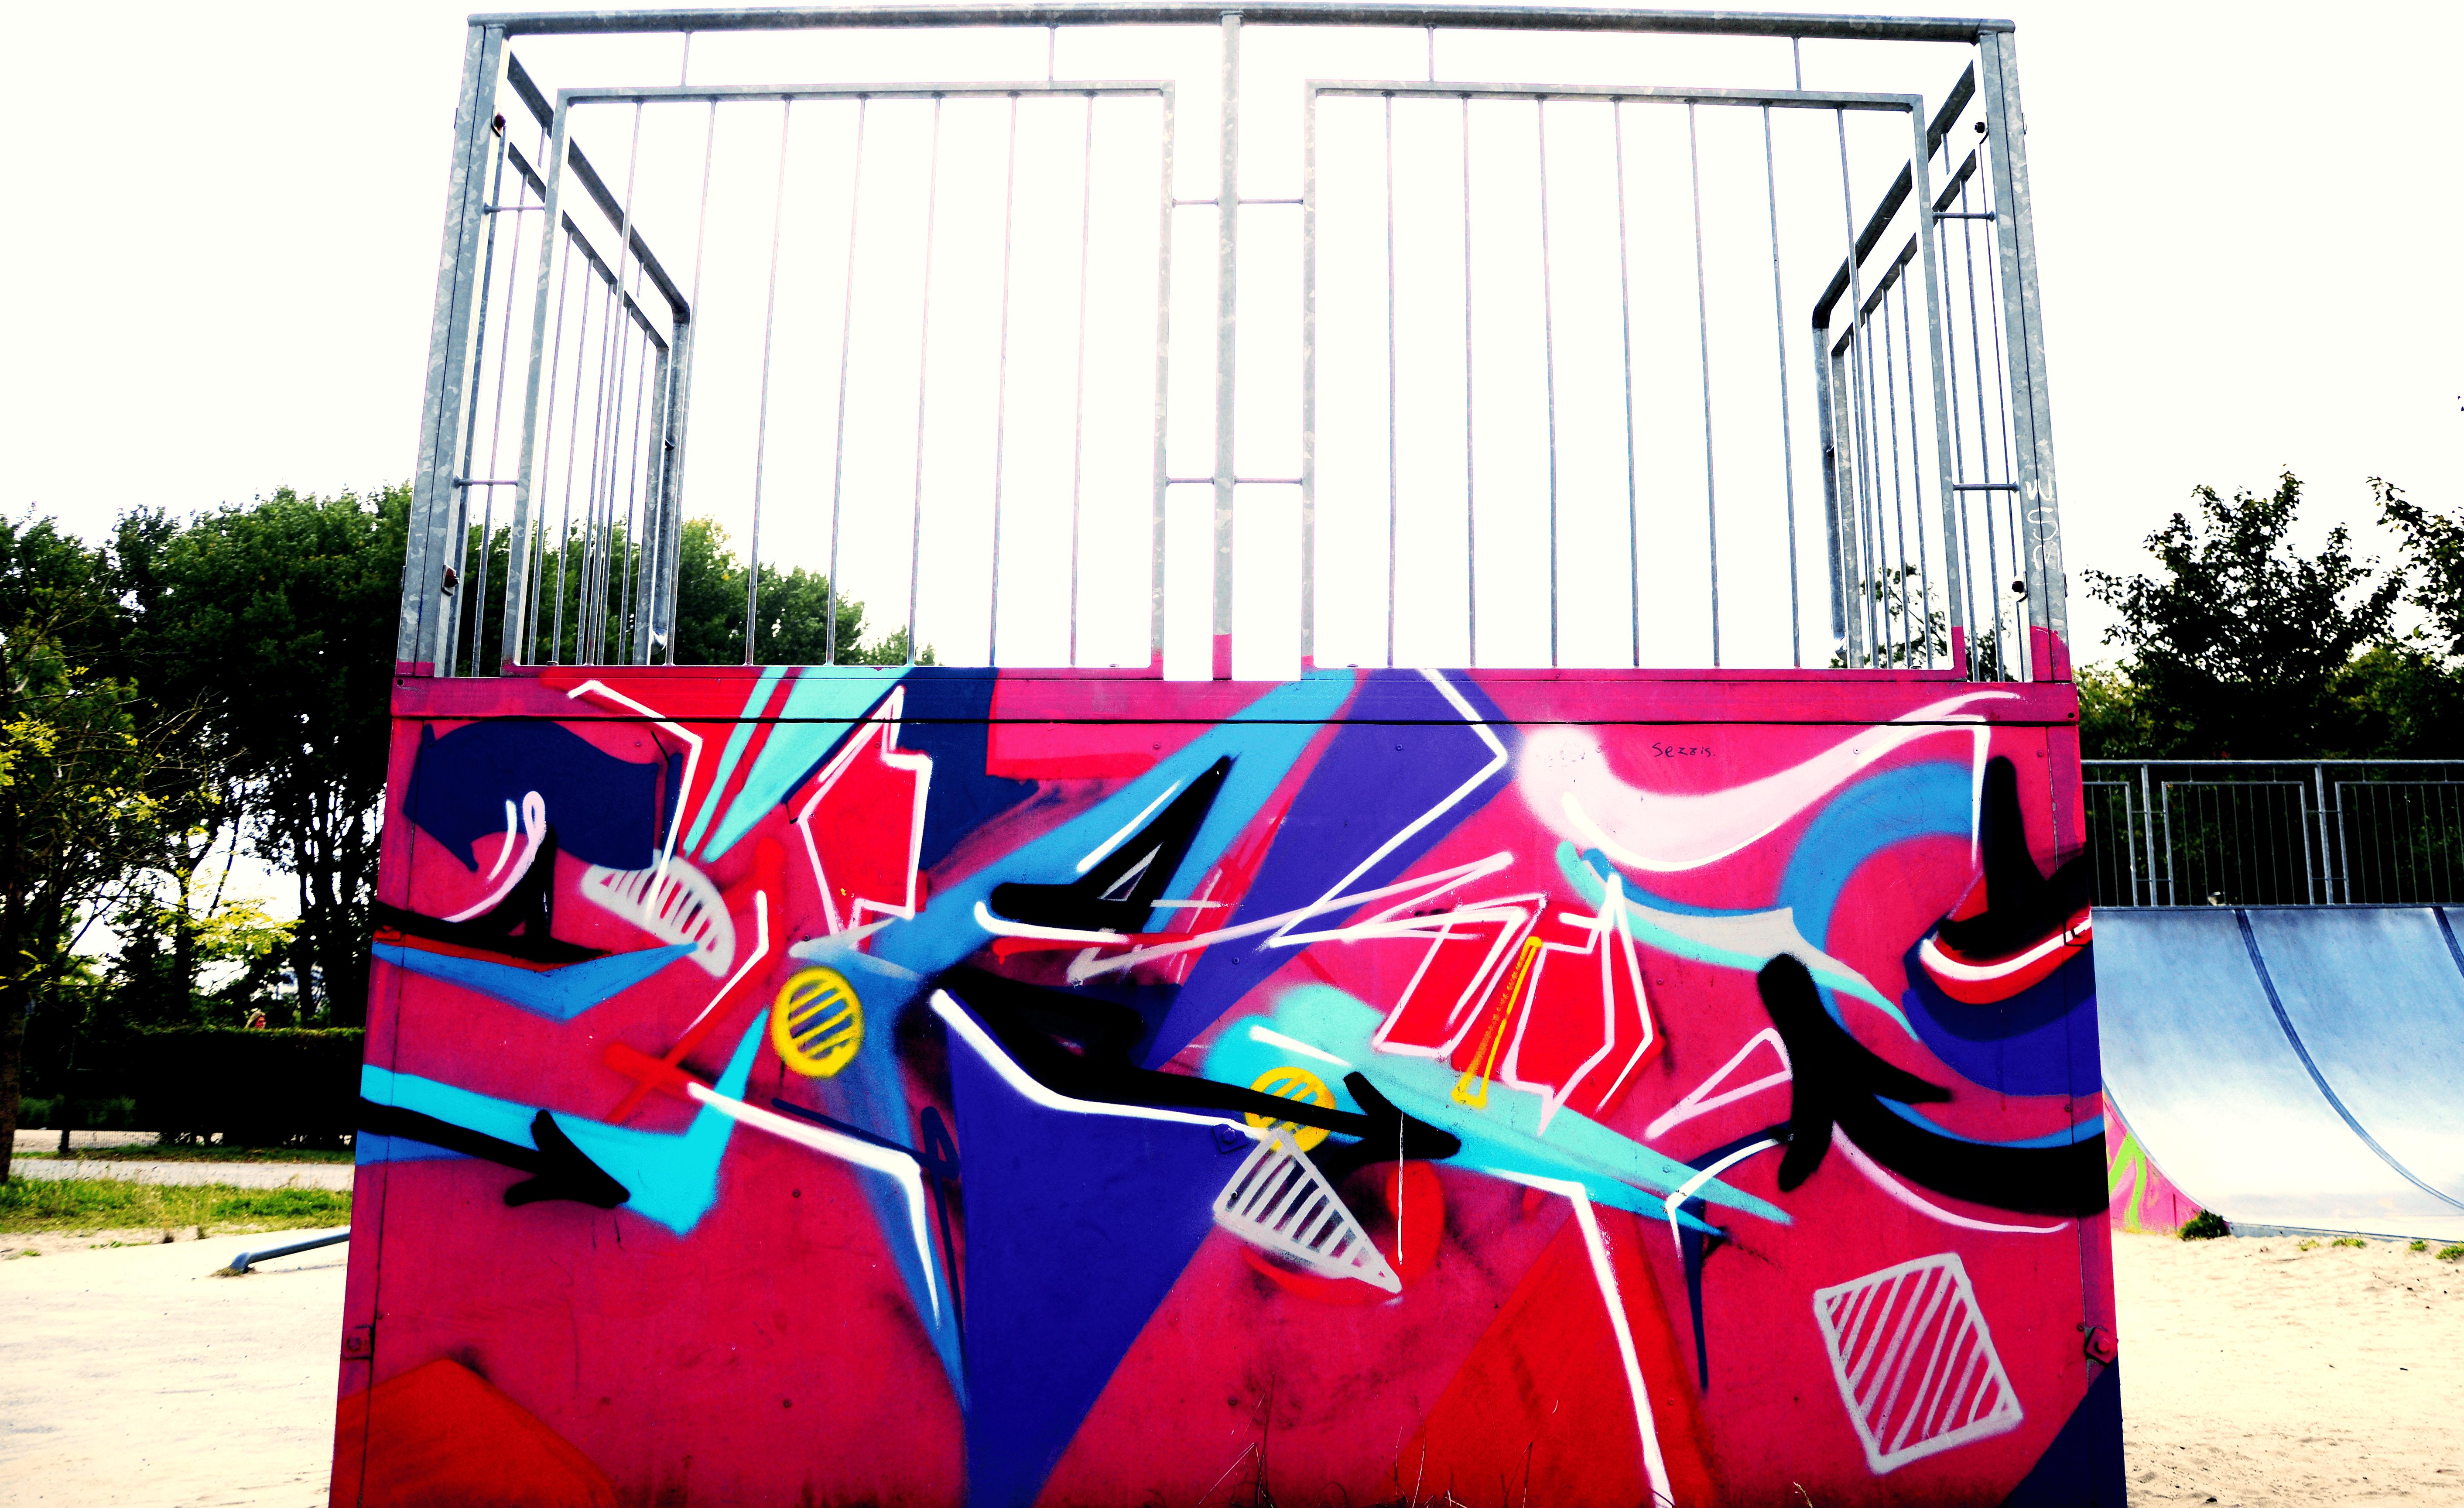 Zas3_Zas_2014-min